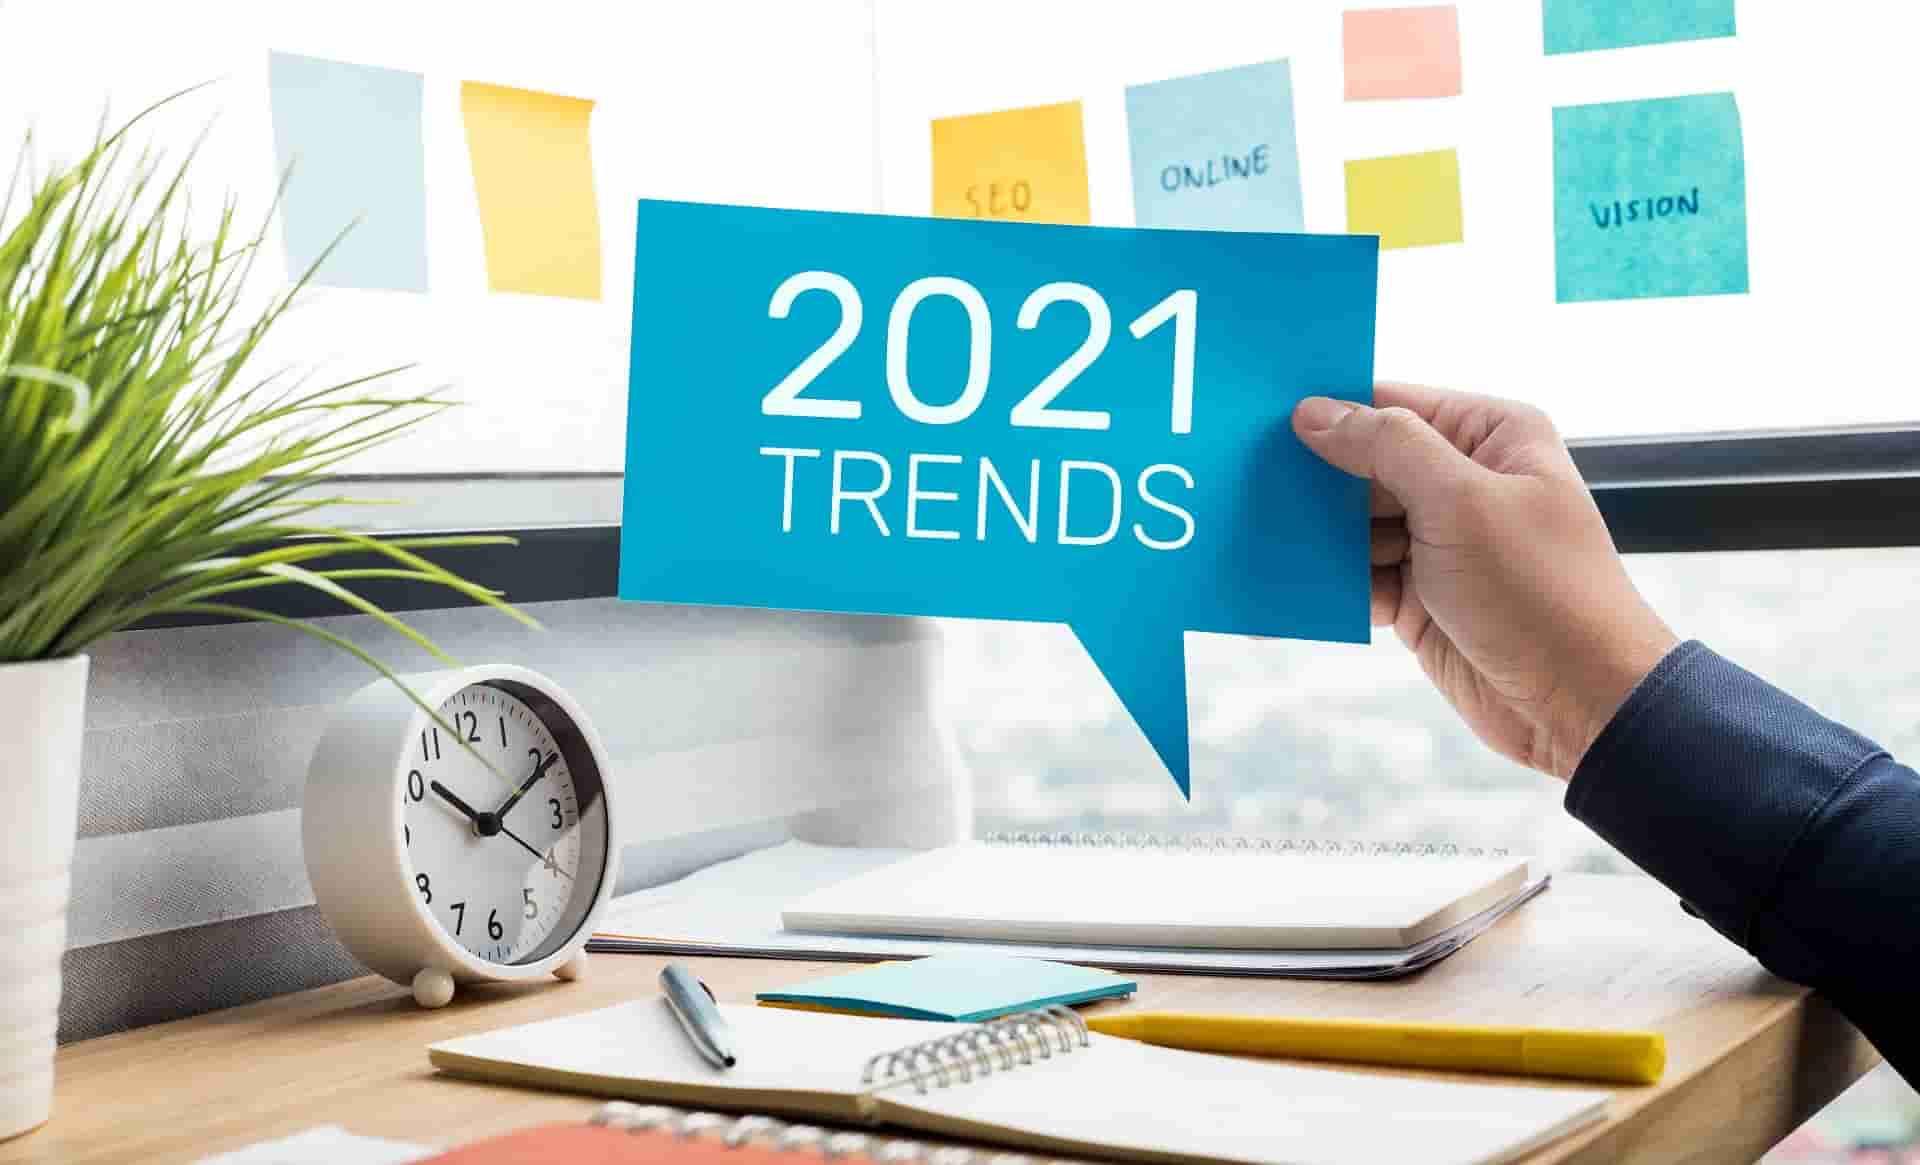 B2B-Marketingtrends 2021